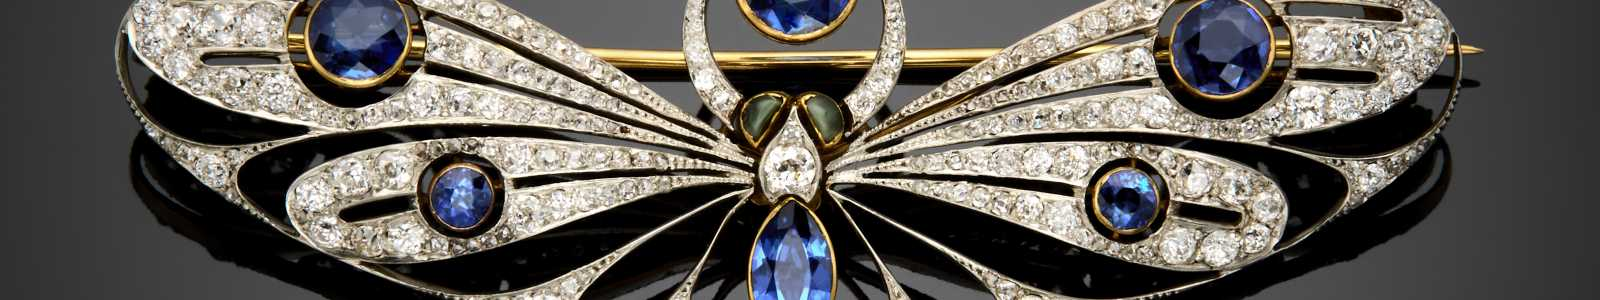 A513-I: Jewels